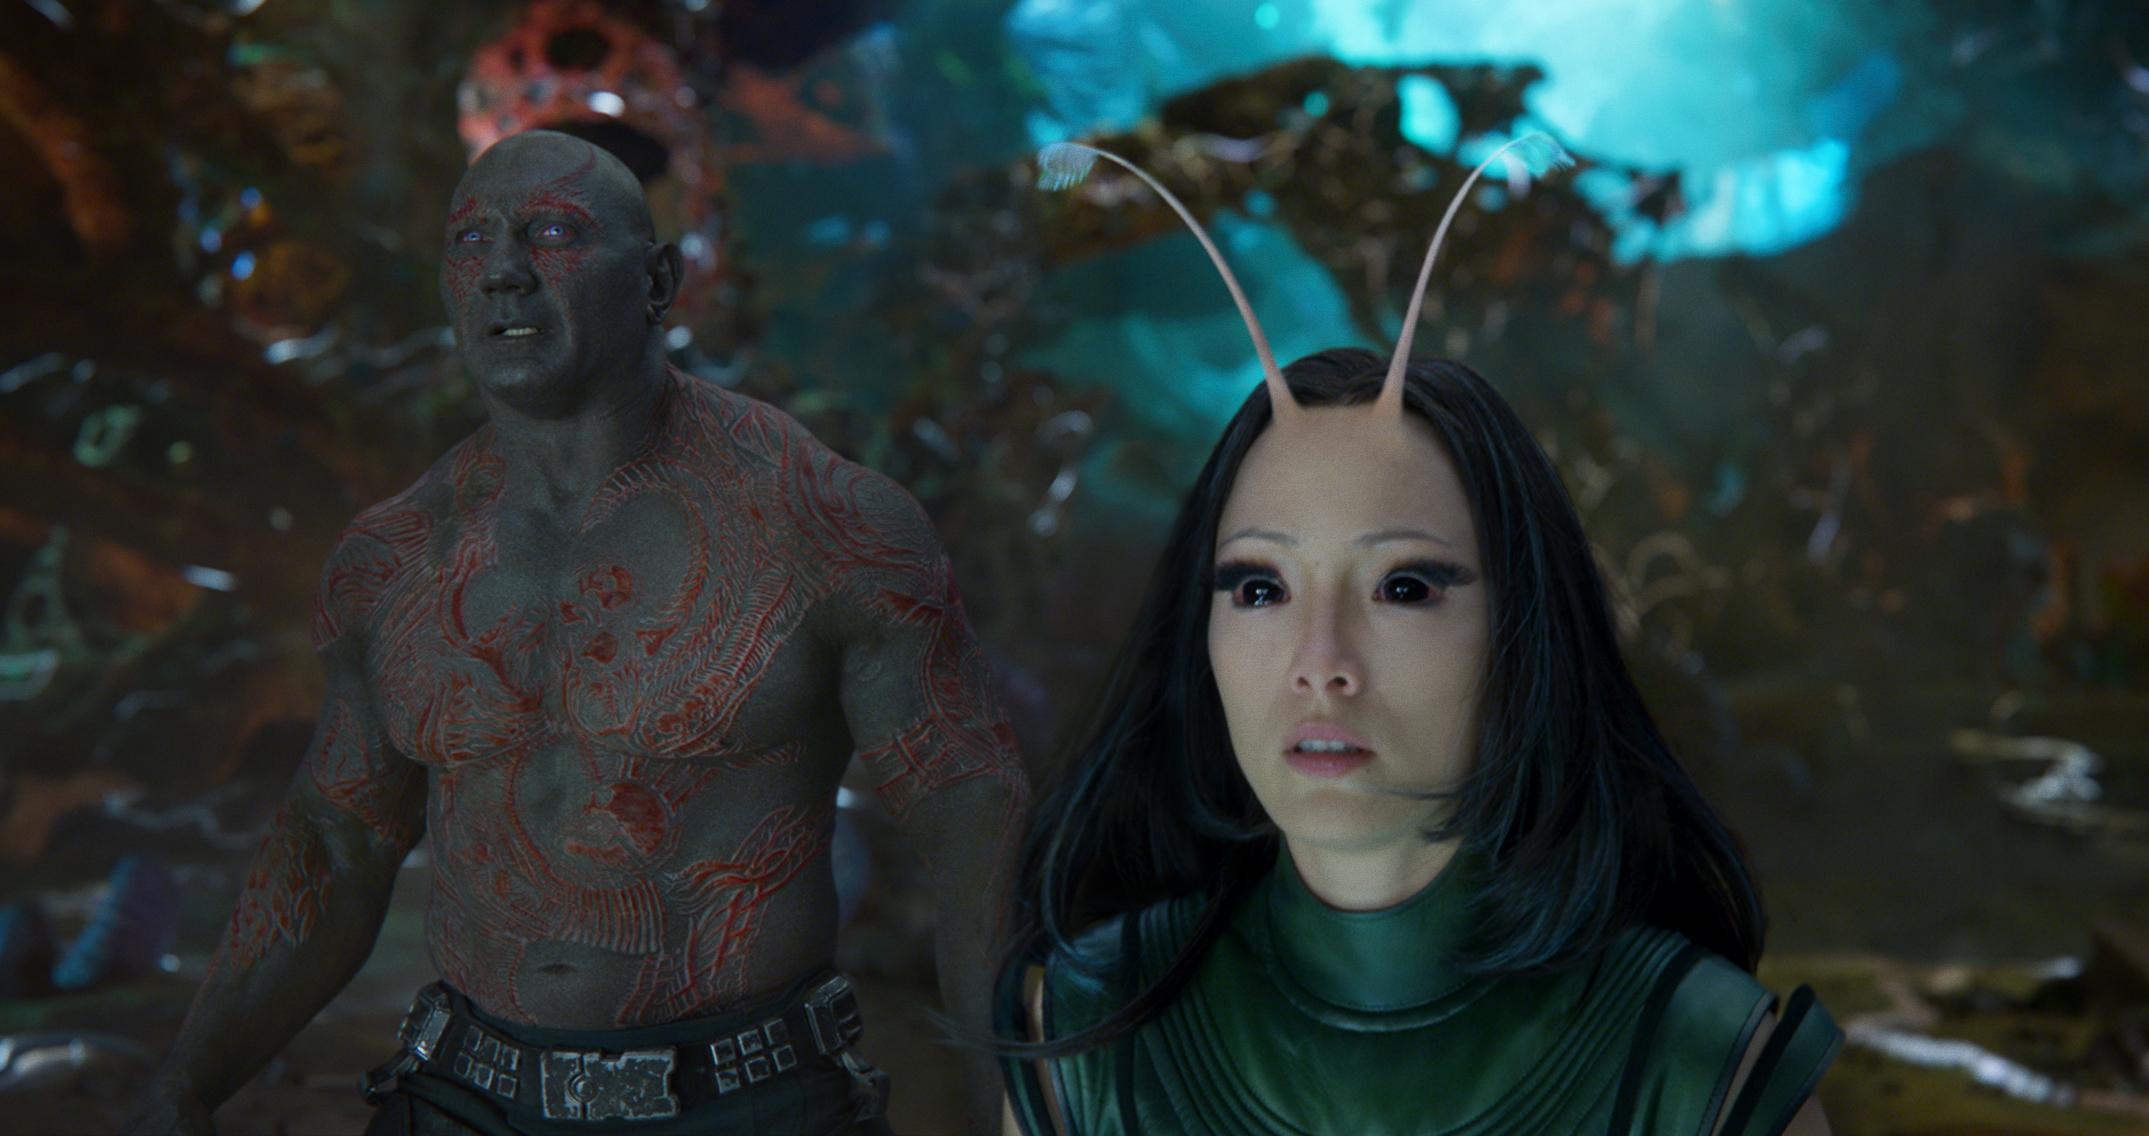 Matis Guardians of the Galaxy Vol 2